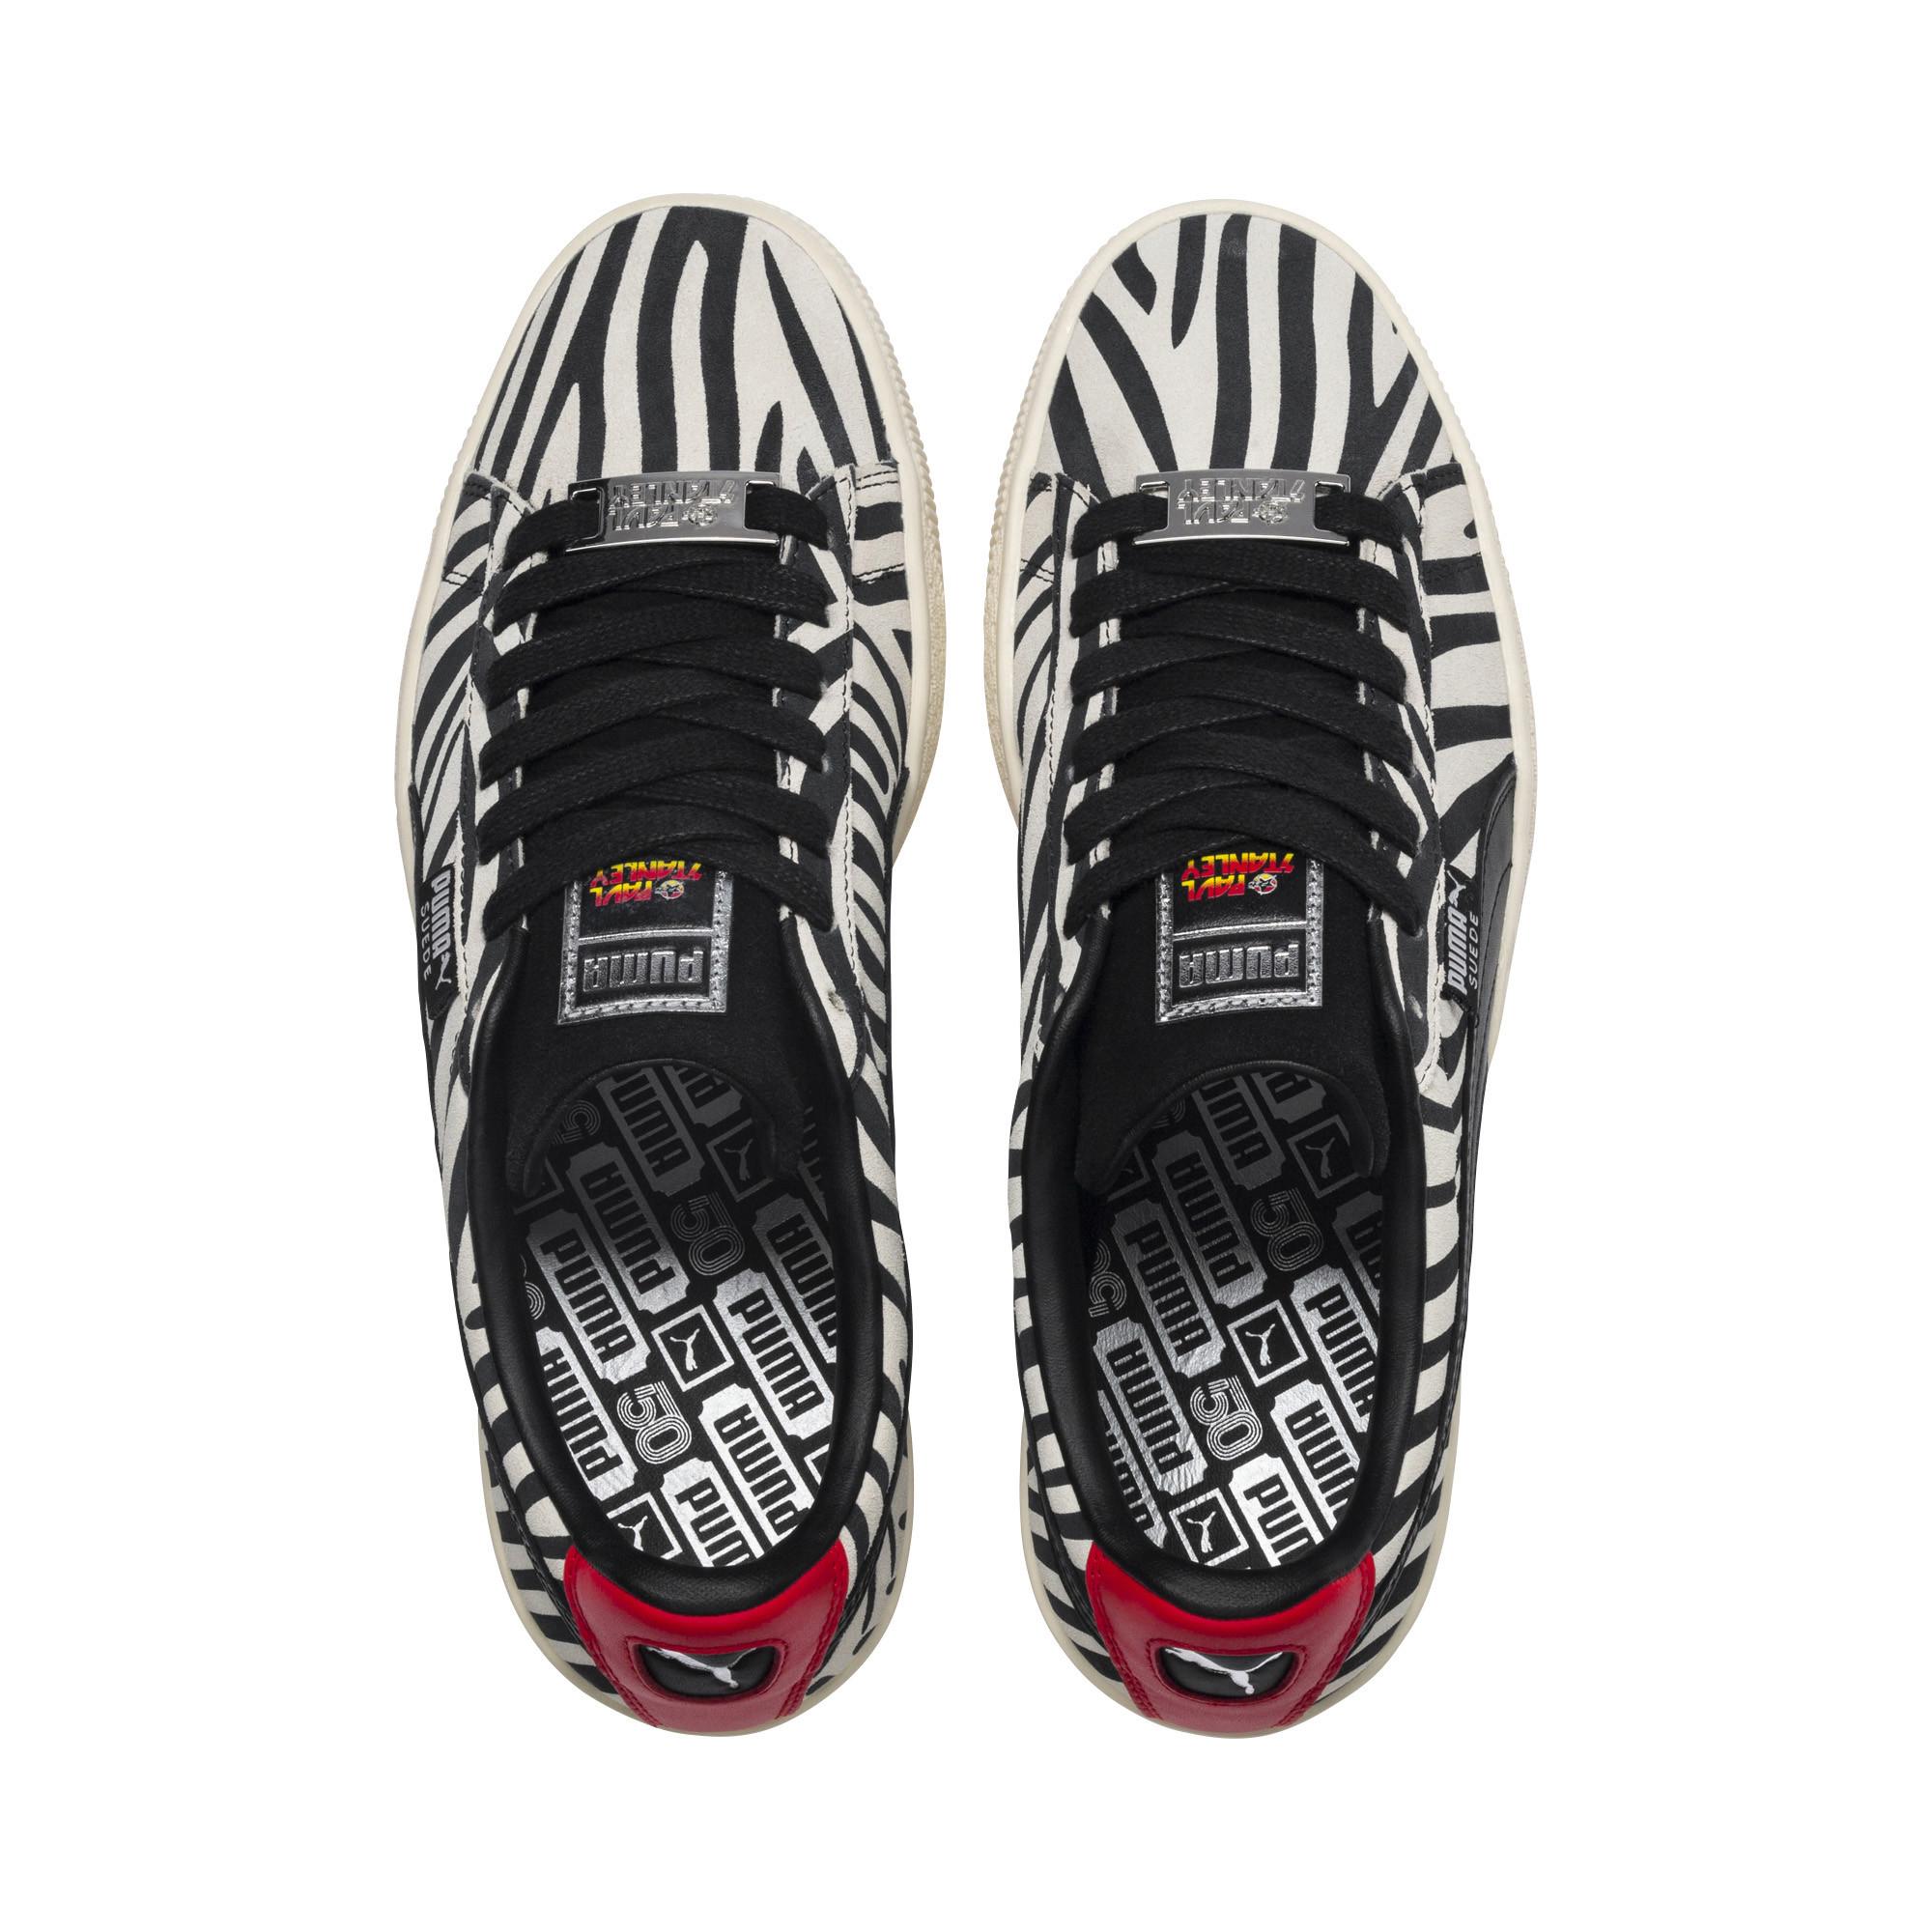 358fa36d772 Puma x Paul Stanley collaboration sneakers finally drops - Biggest Kaka